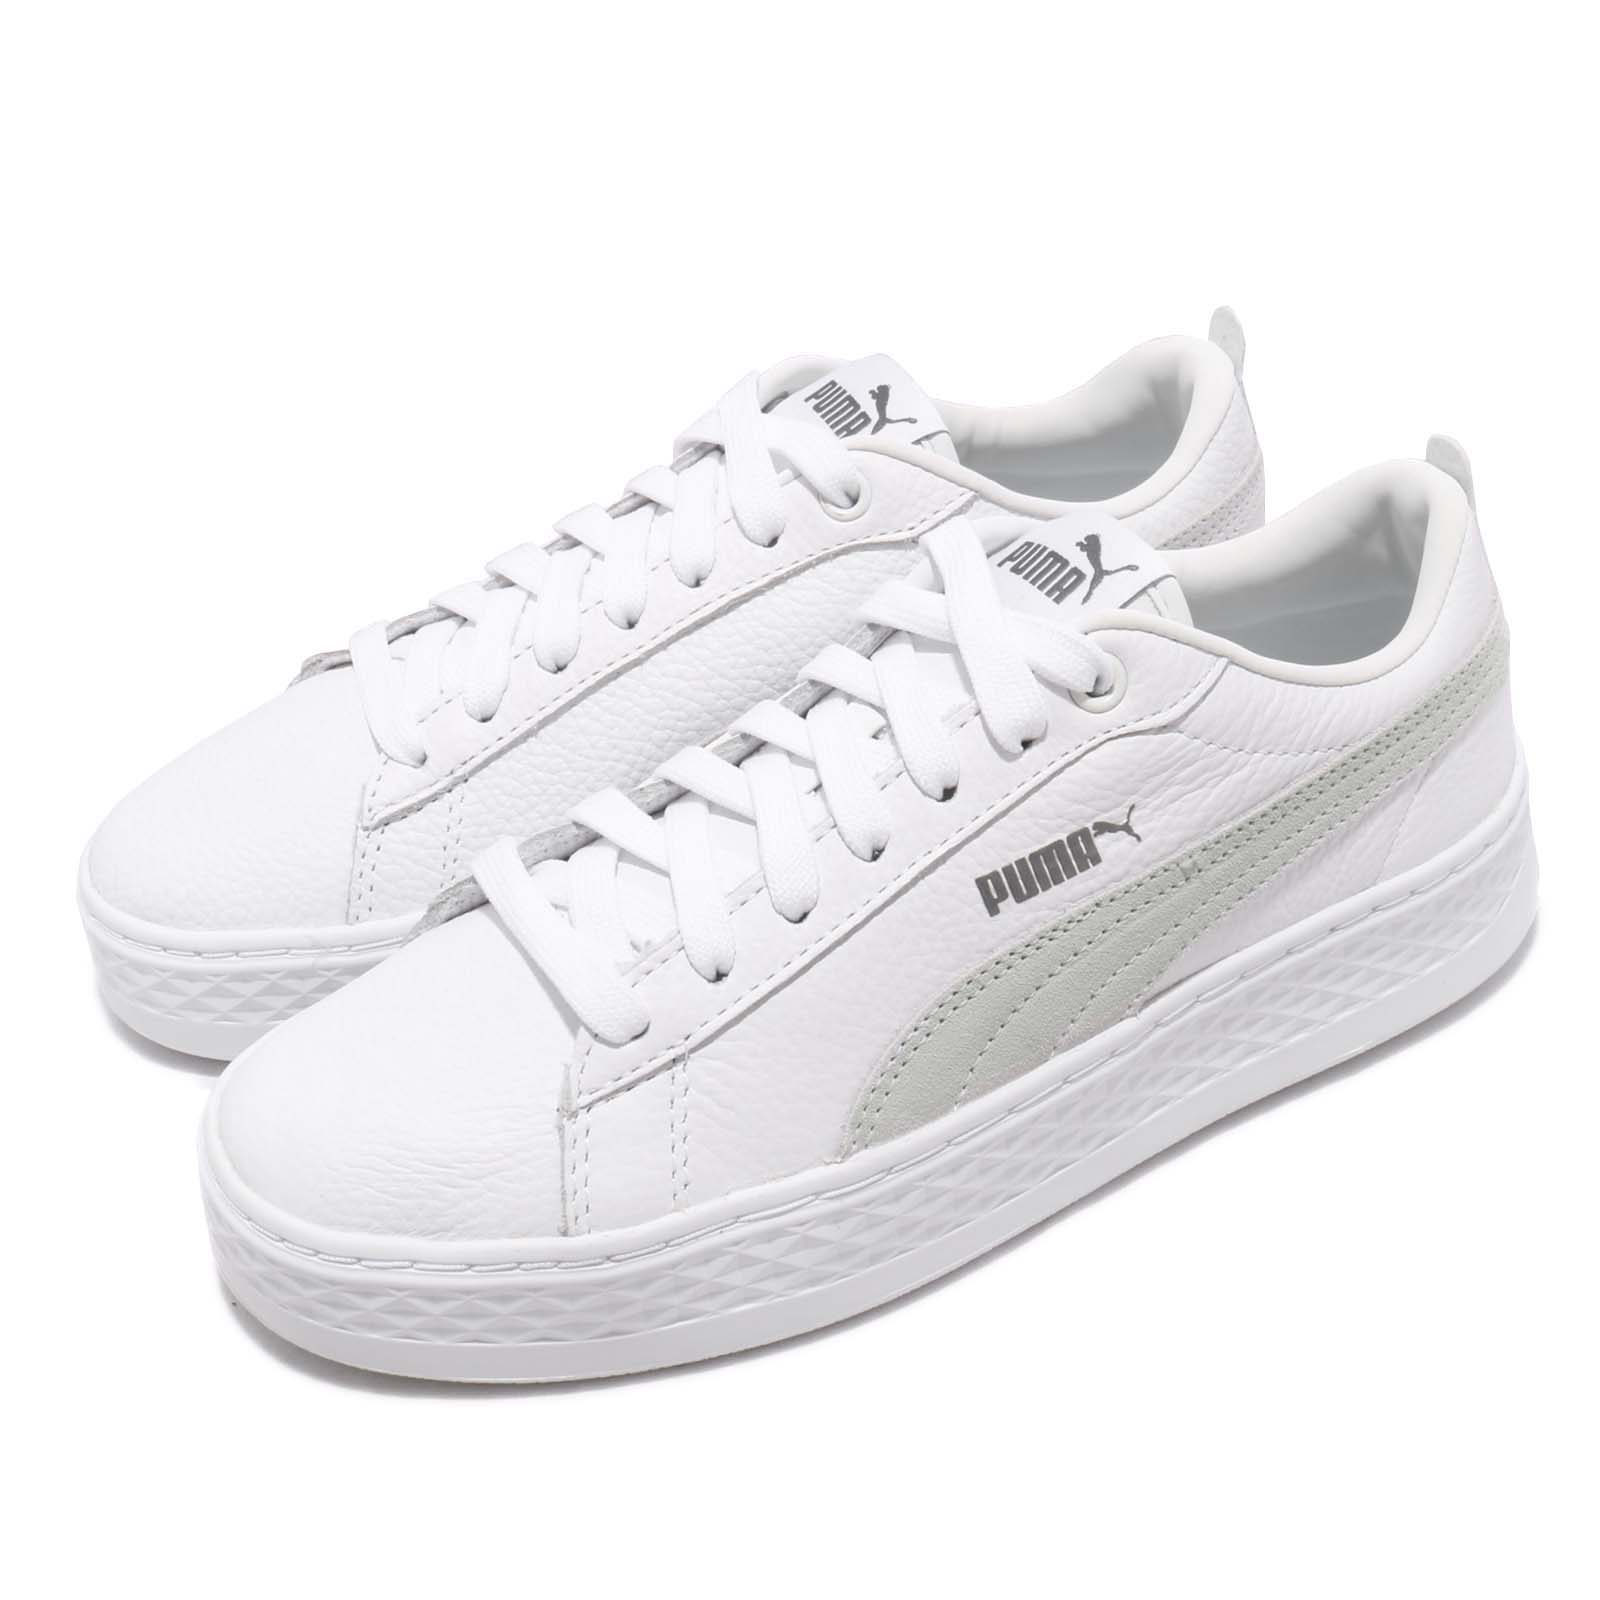 Puma 休閒鞋 Smash Platform L 復古 女鞋 36648706